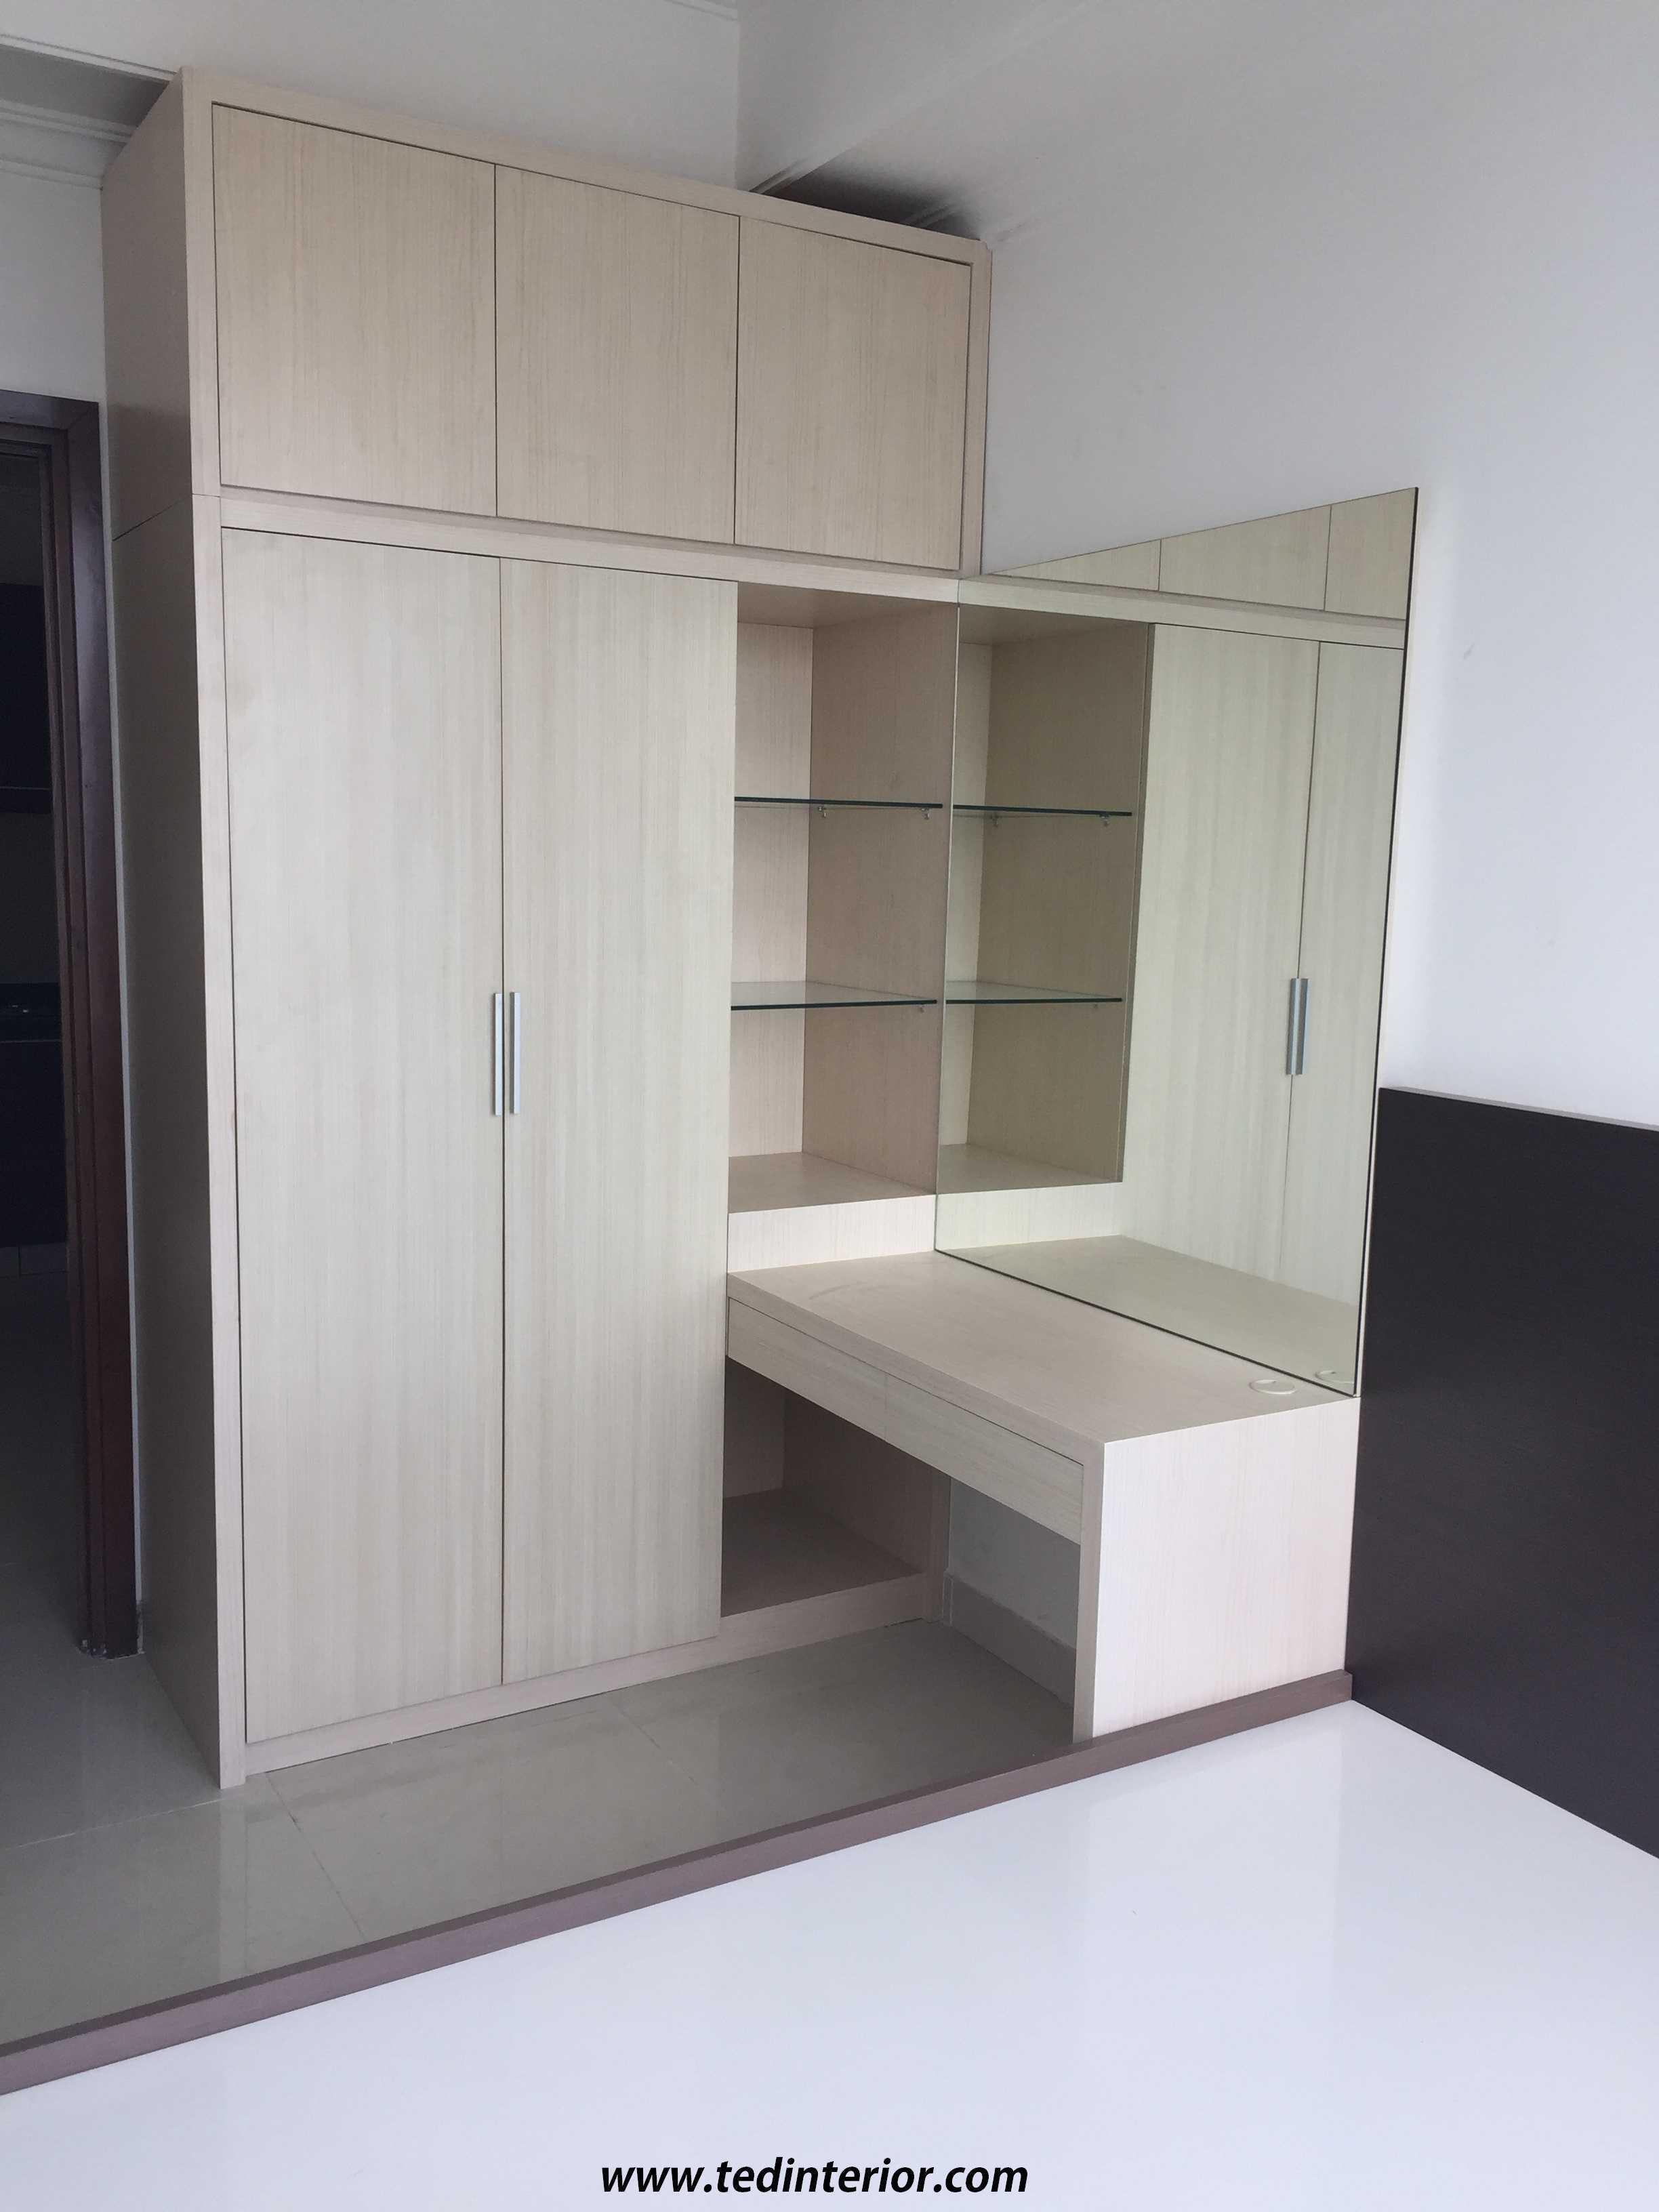 Pd Teguh Desain Indonesia Apartment Kuningan City Jakarta, Indonesia Jakarta, Indonesia Kid-Bedroom-2 Modern  34868